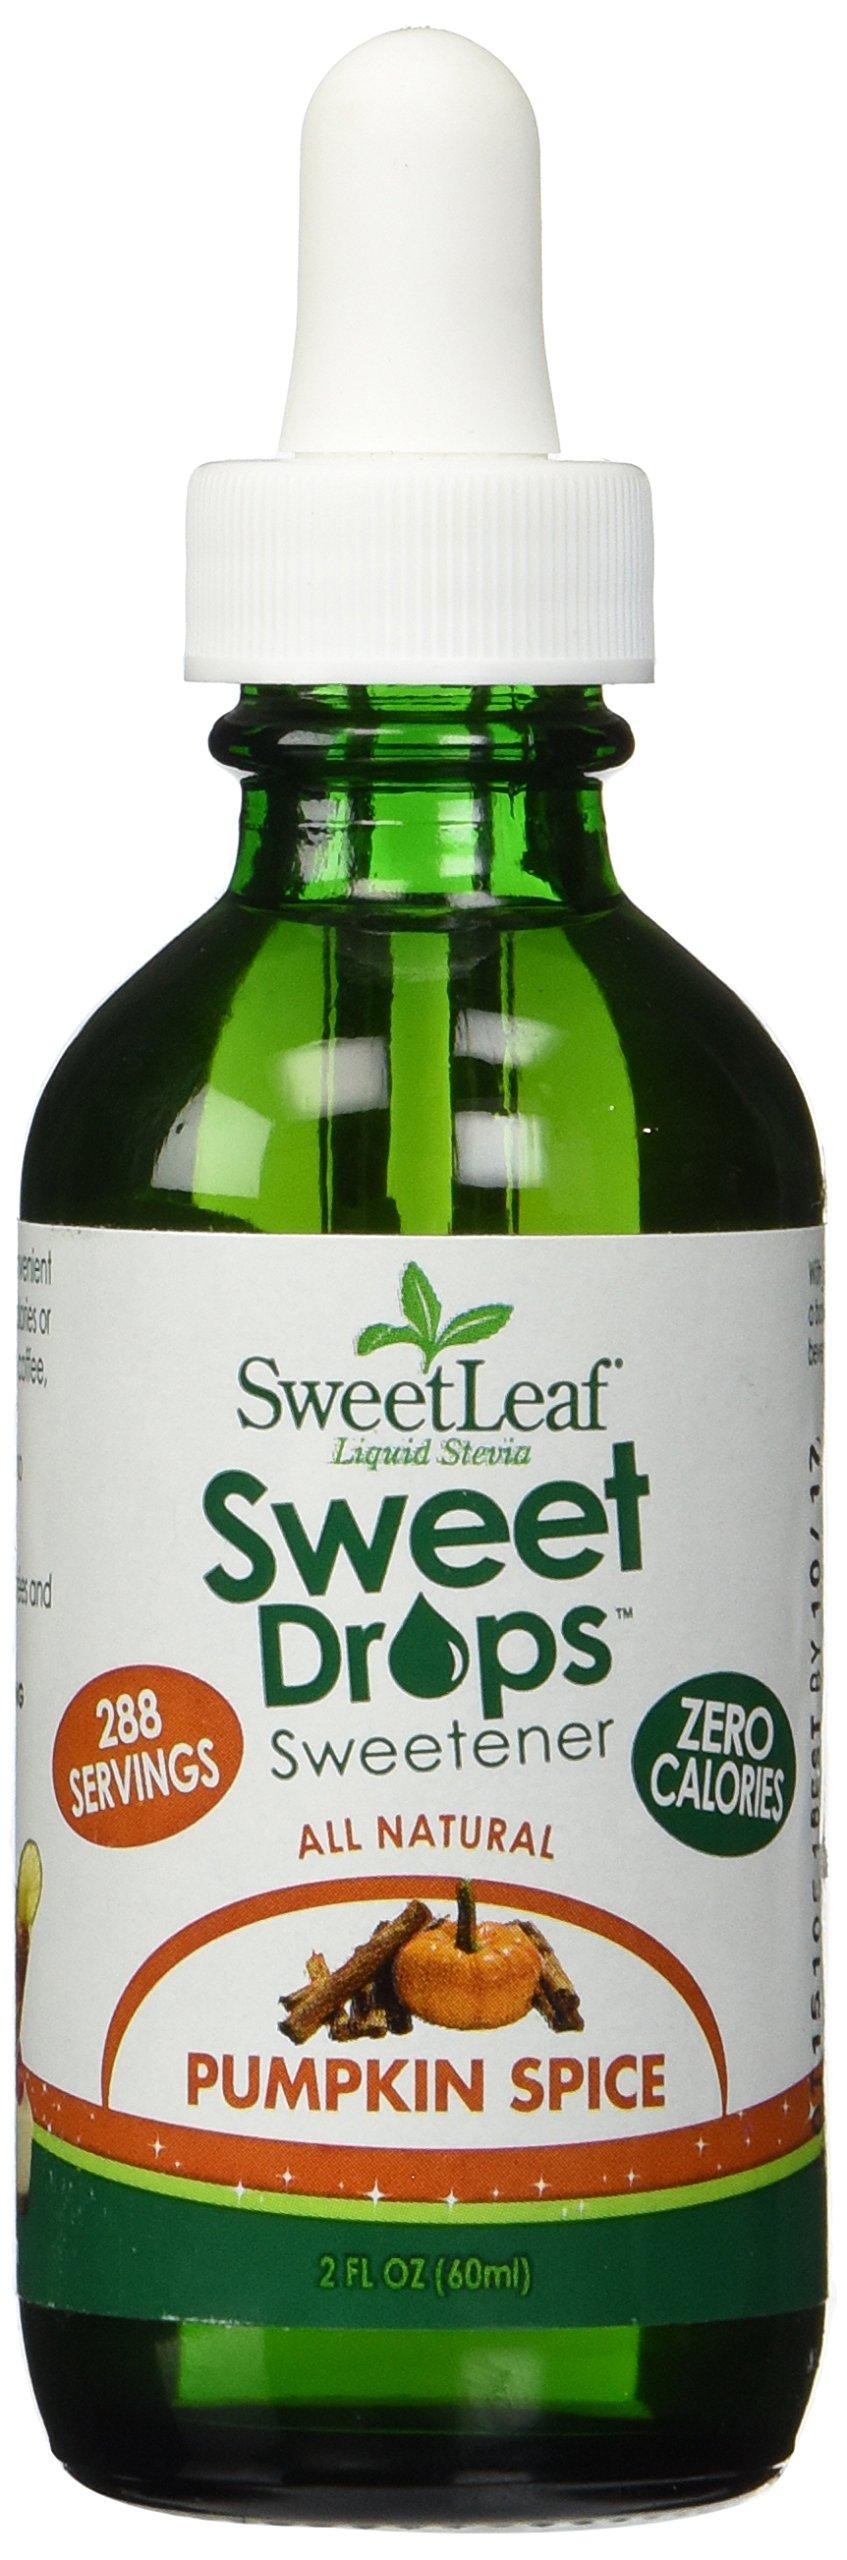 Stevia Pumpkin Spice SweetLeaf 2 oz Liquid